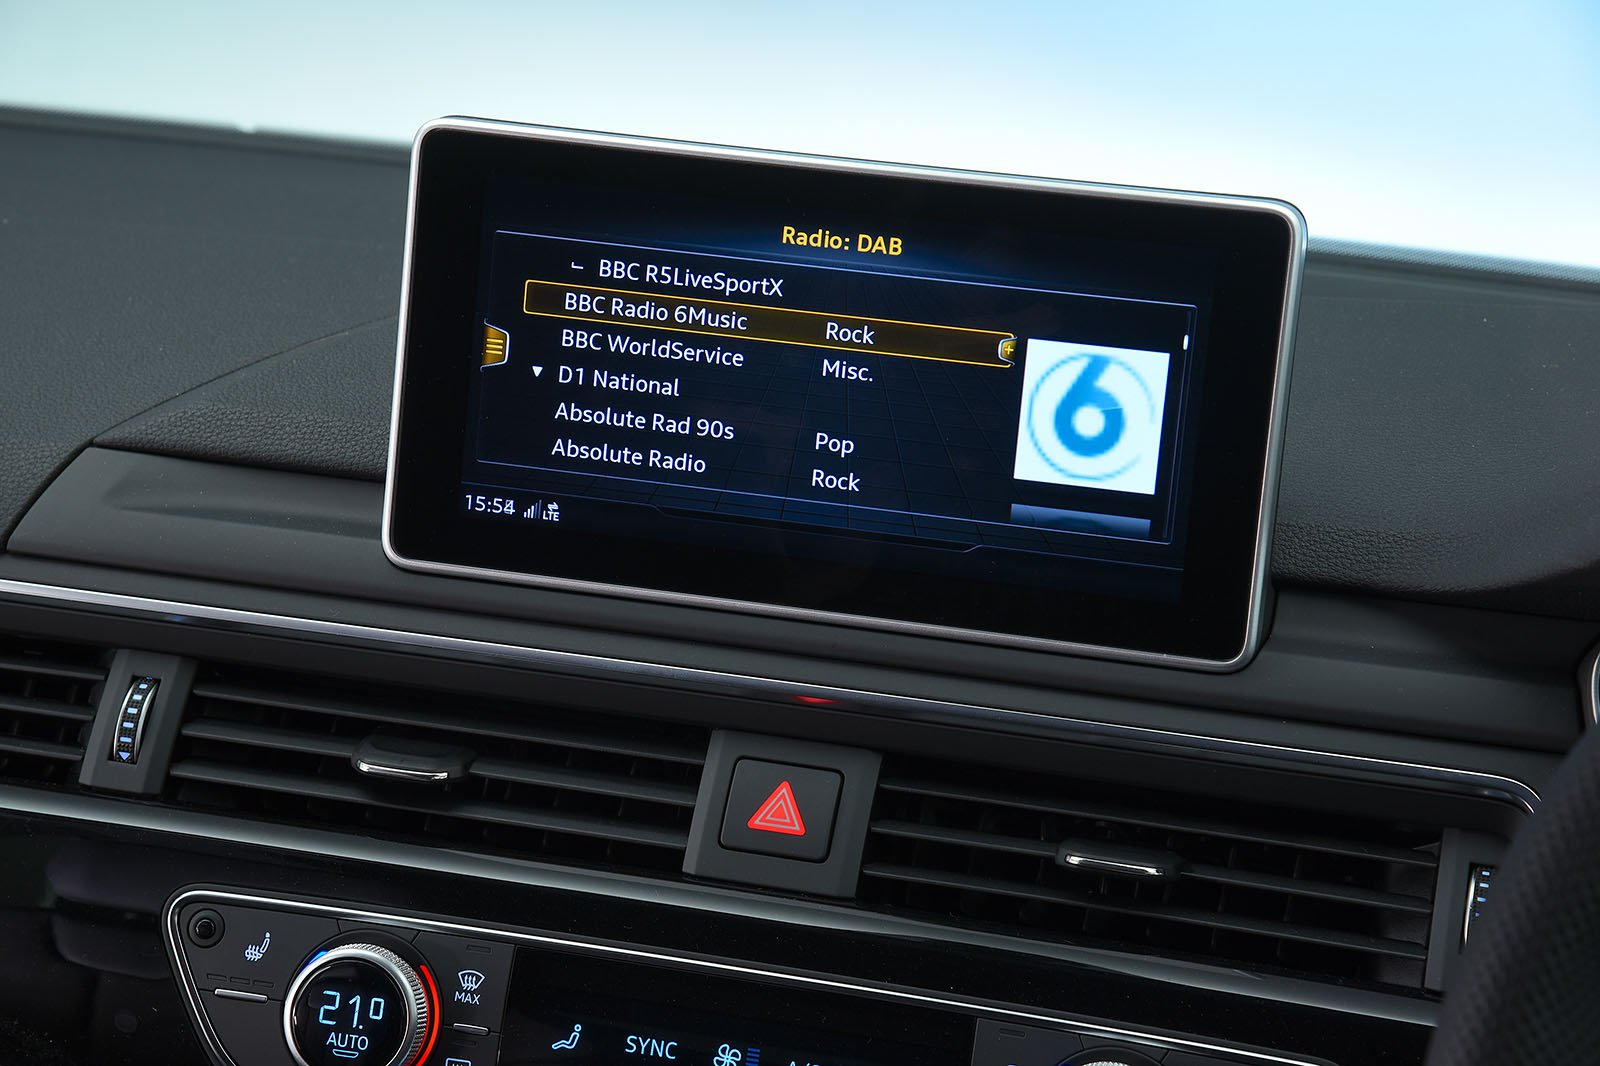 2018 Audi A4 Avant infotainment